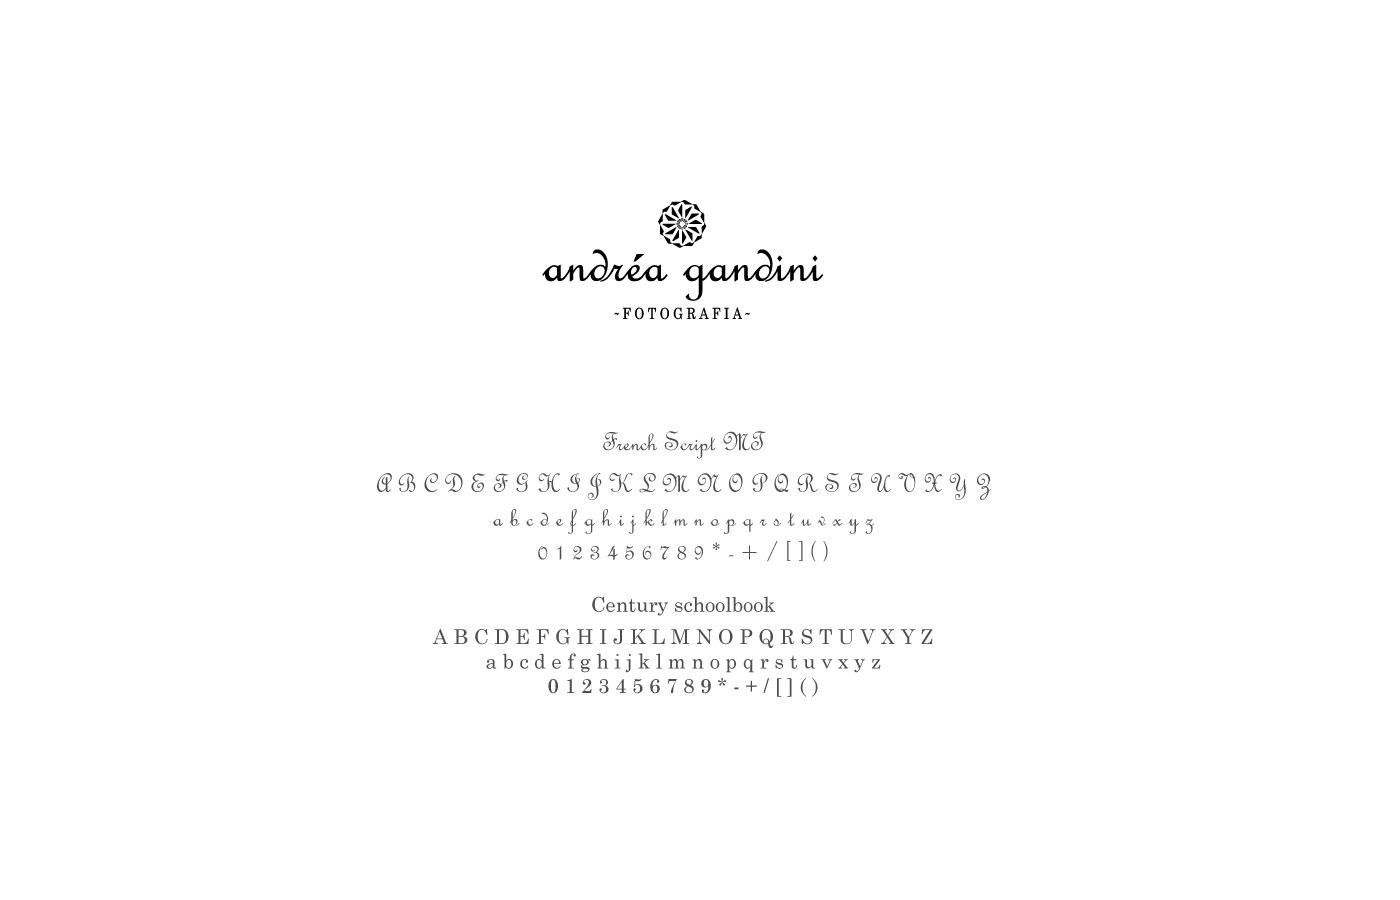 port-andrea-gandini-be-1400px-04